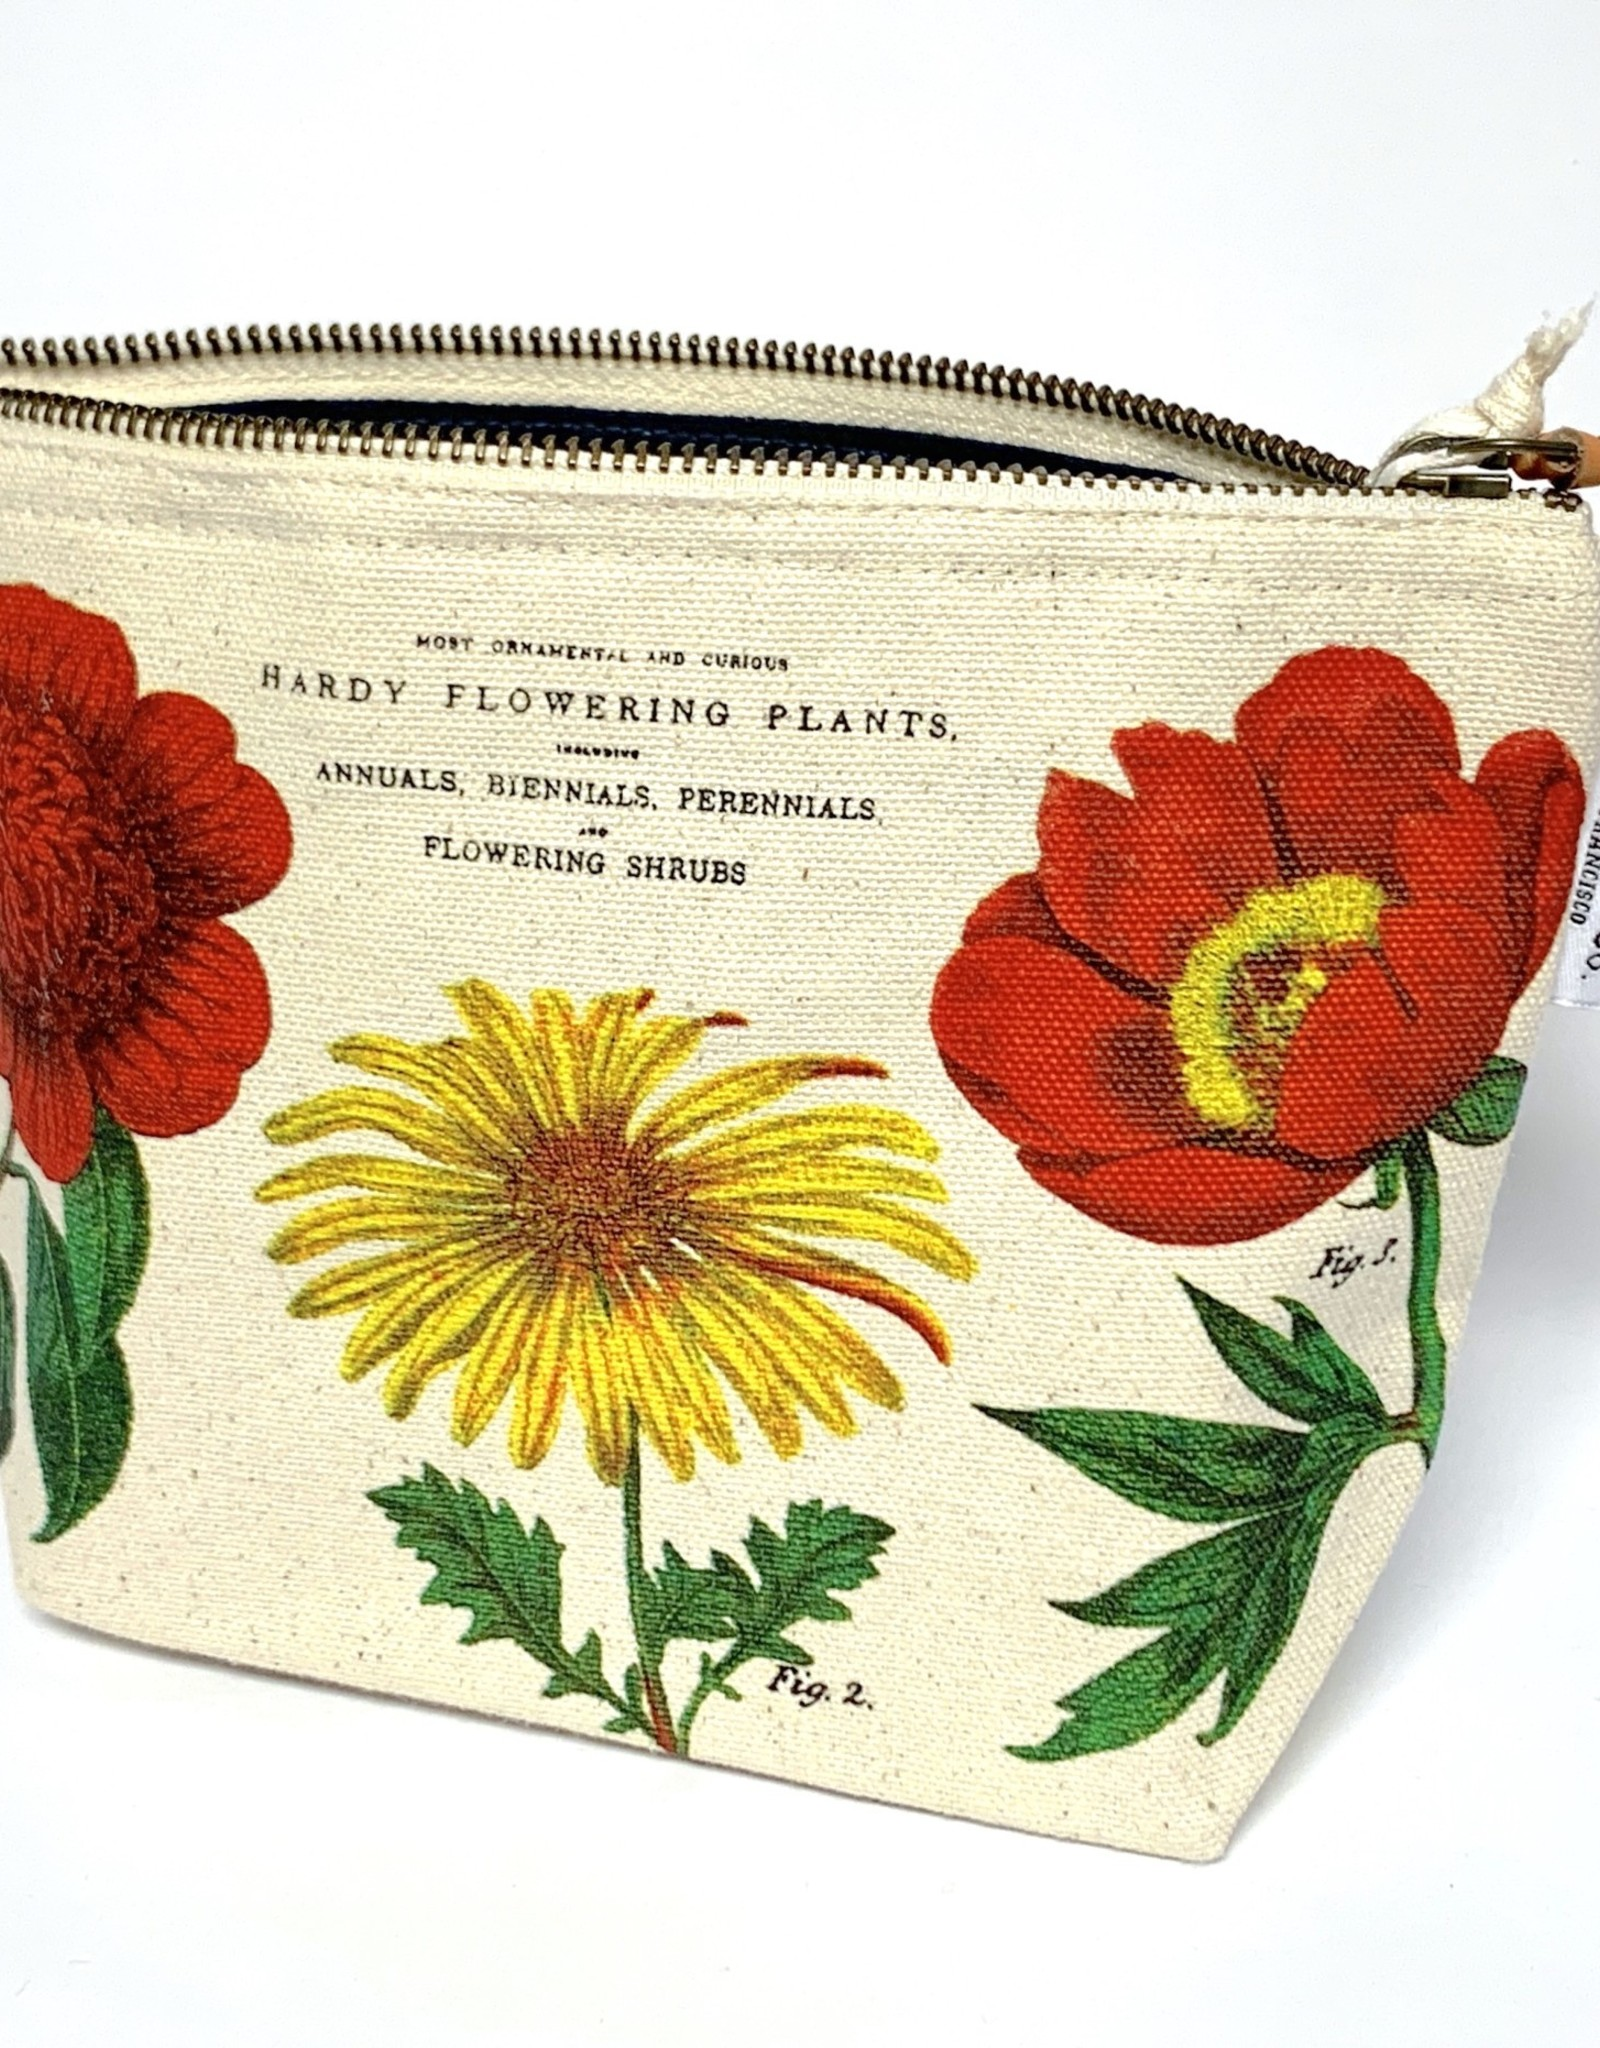 Cavallini Cavallini Vintage Inspired Pouch, Botanica